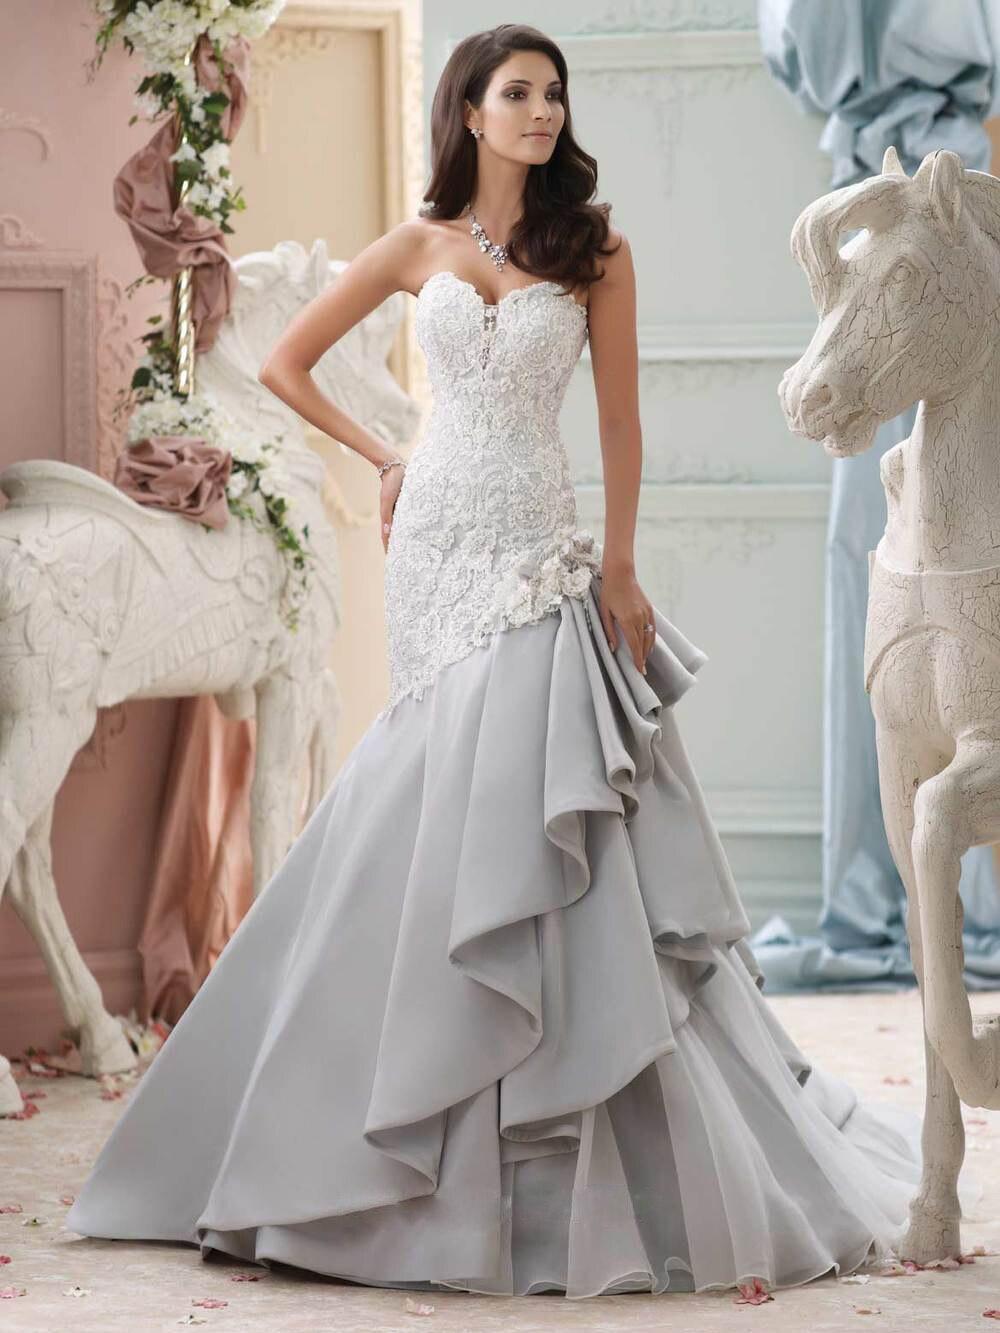 Trouwjurk Wholesale Ruffled Mermaid Luxury Custom Made Plus Size Vintage Satin Lace Appliqued Wedding Dresses Brautkleid JAN01